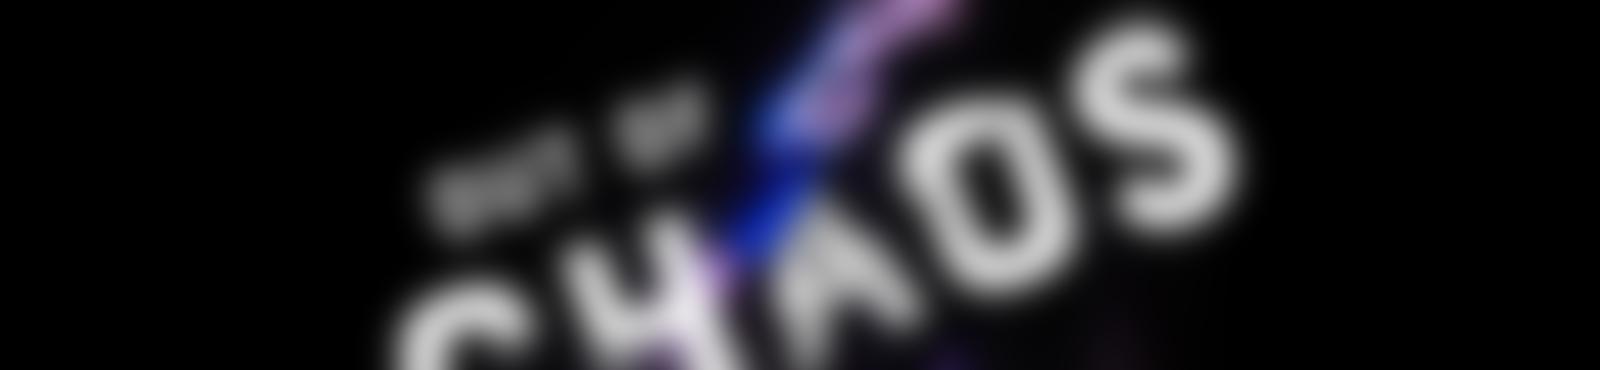 Blurred 4f6cd1c9 0df6 4763 98de 40f448c53226